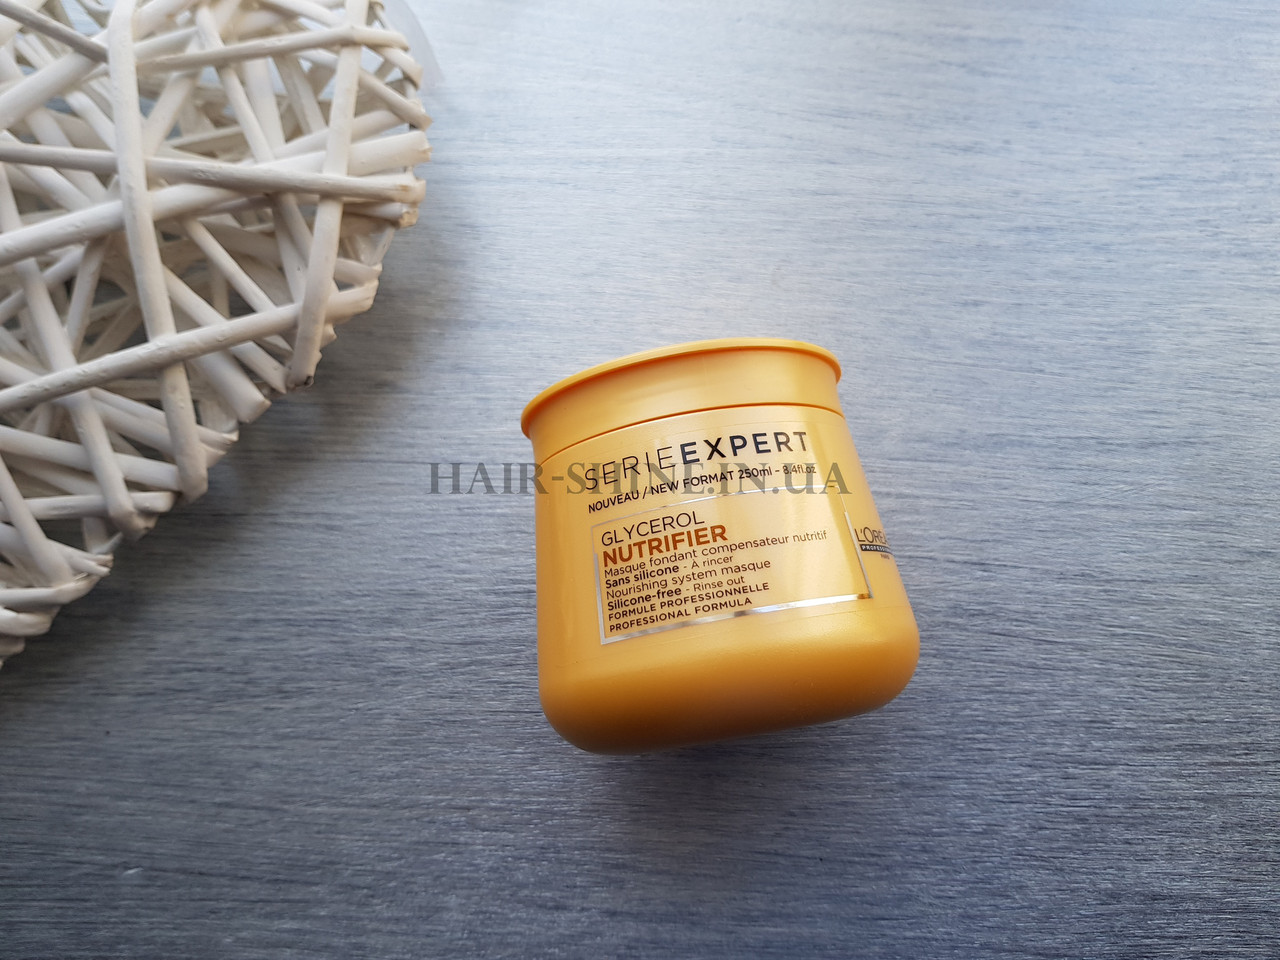 Маска для сухих волос 250мл - L'Oreal Professionnel Nutrifier glycerol  Masque